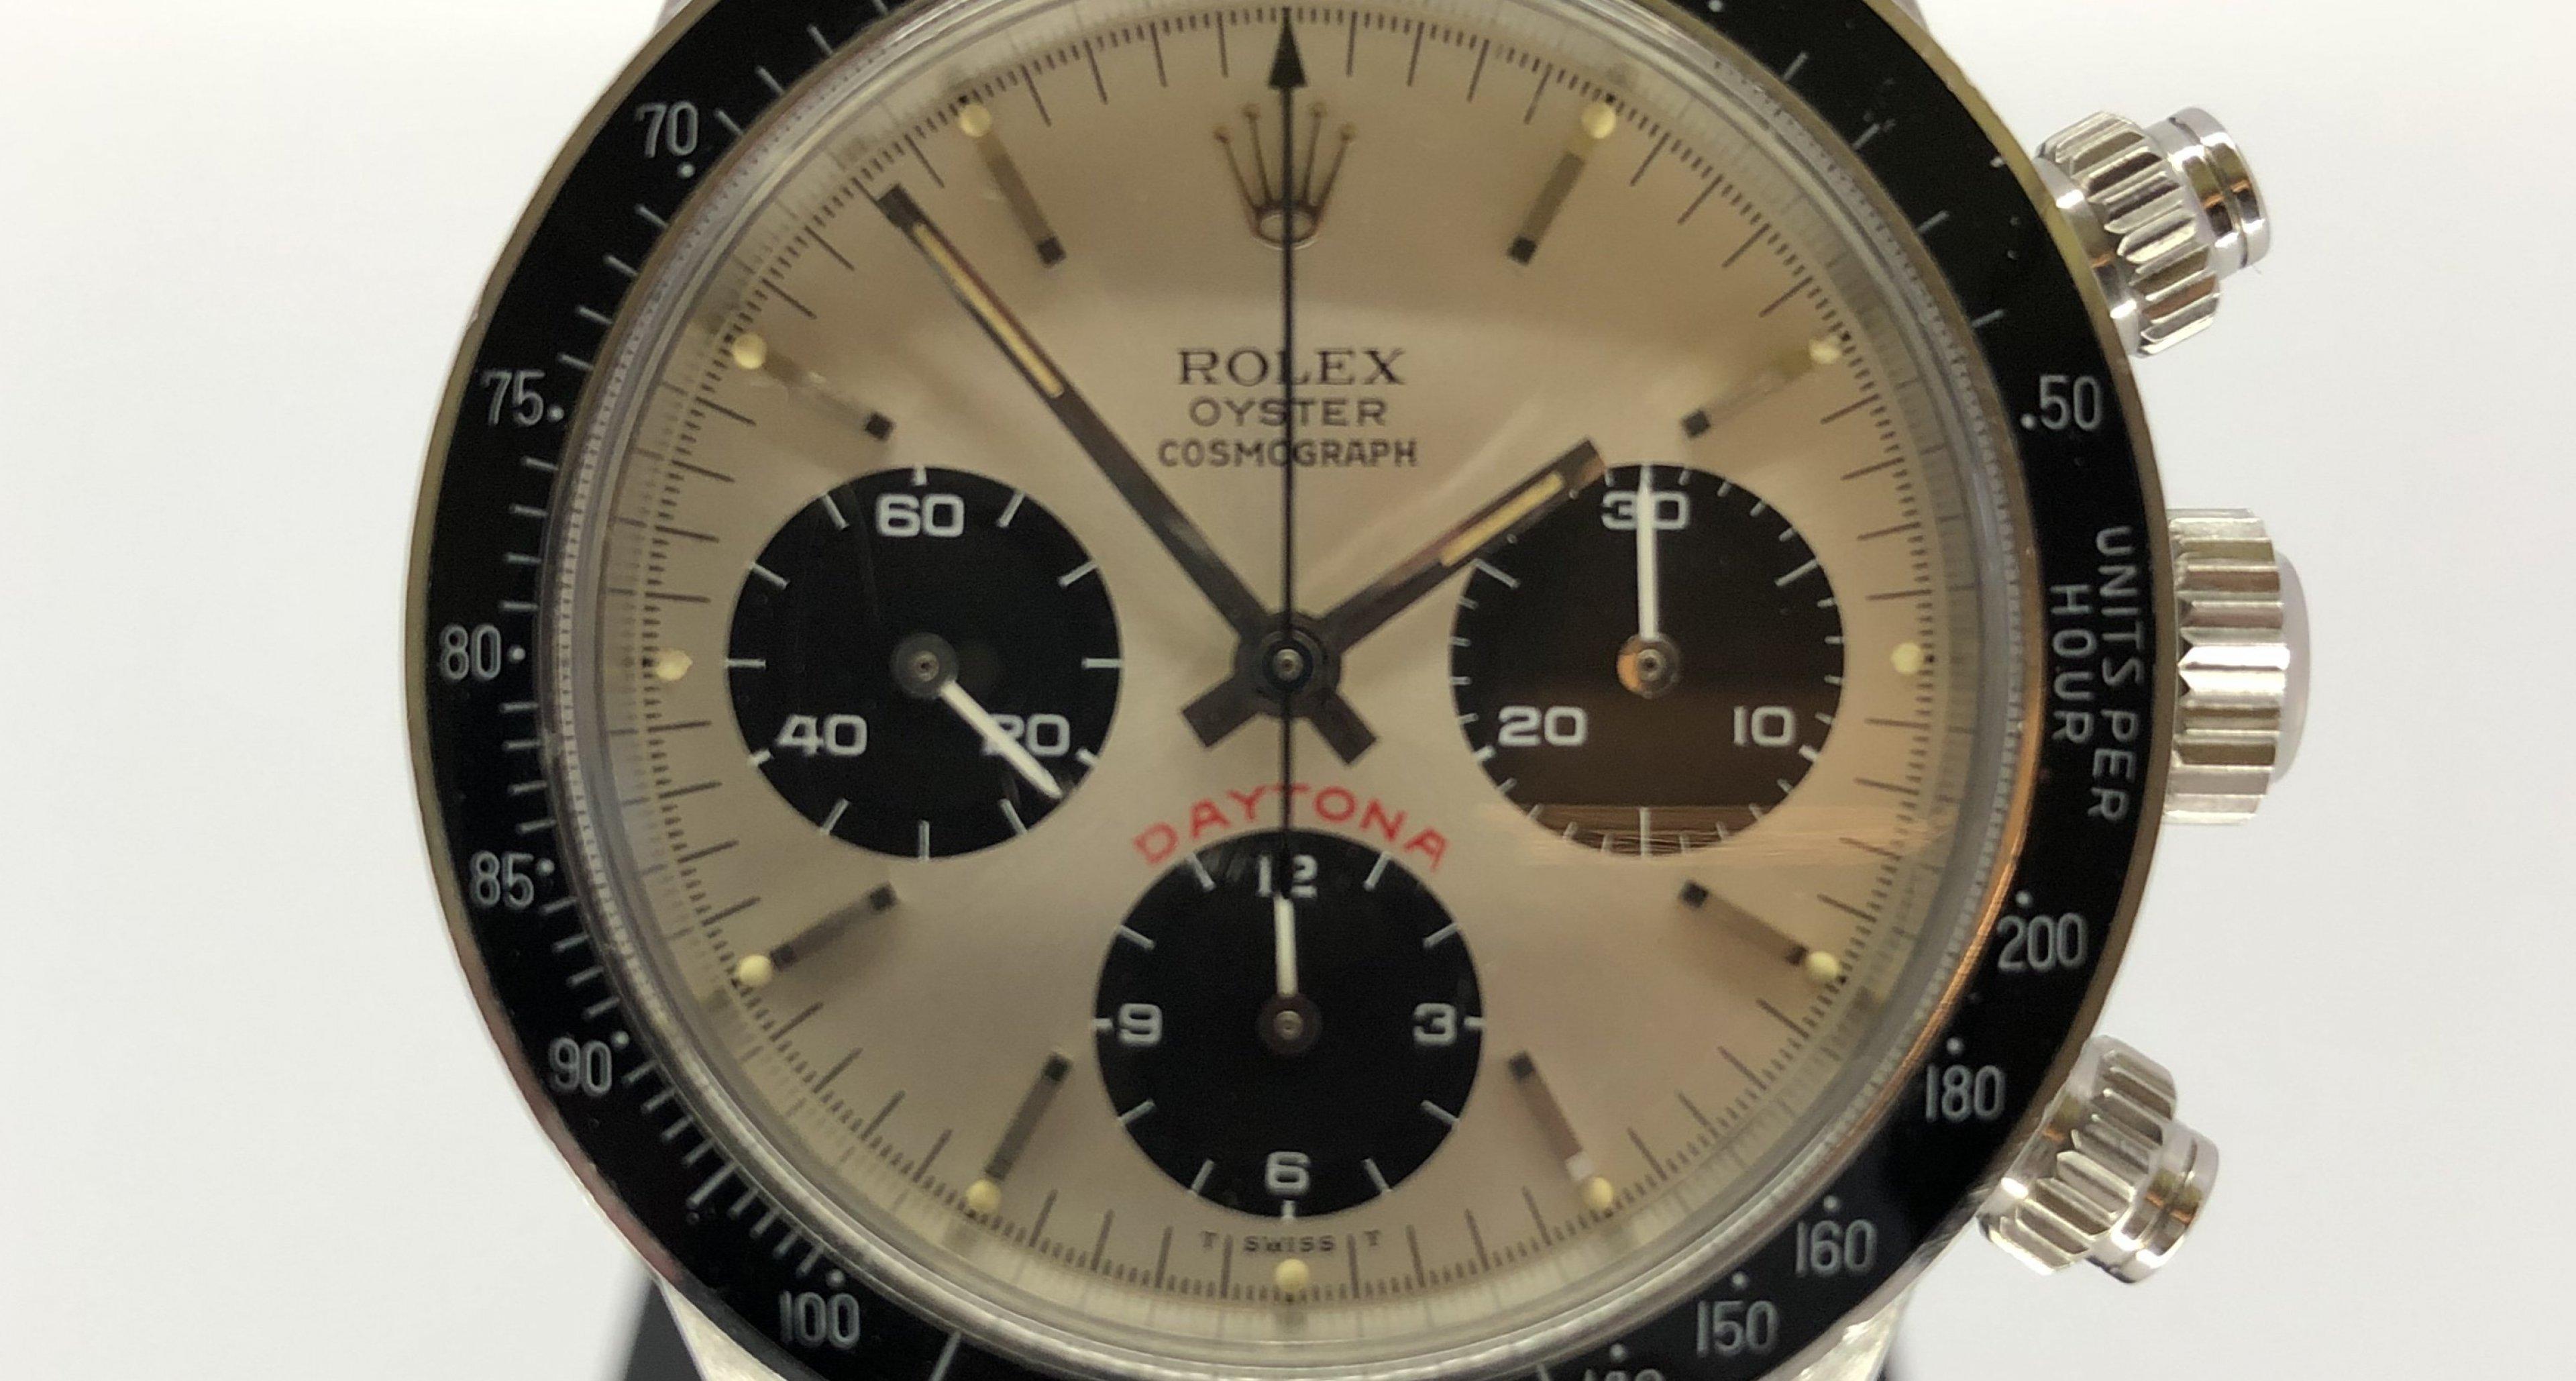 Vintage Watches For Sale >> Vintage Watches For Sale Classic Driver